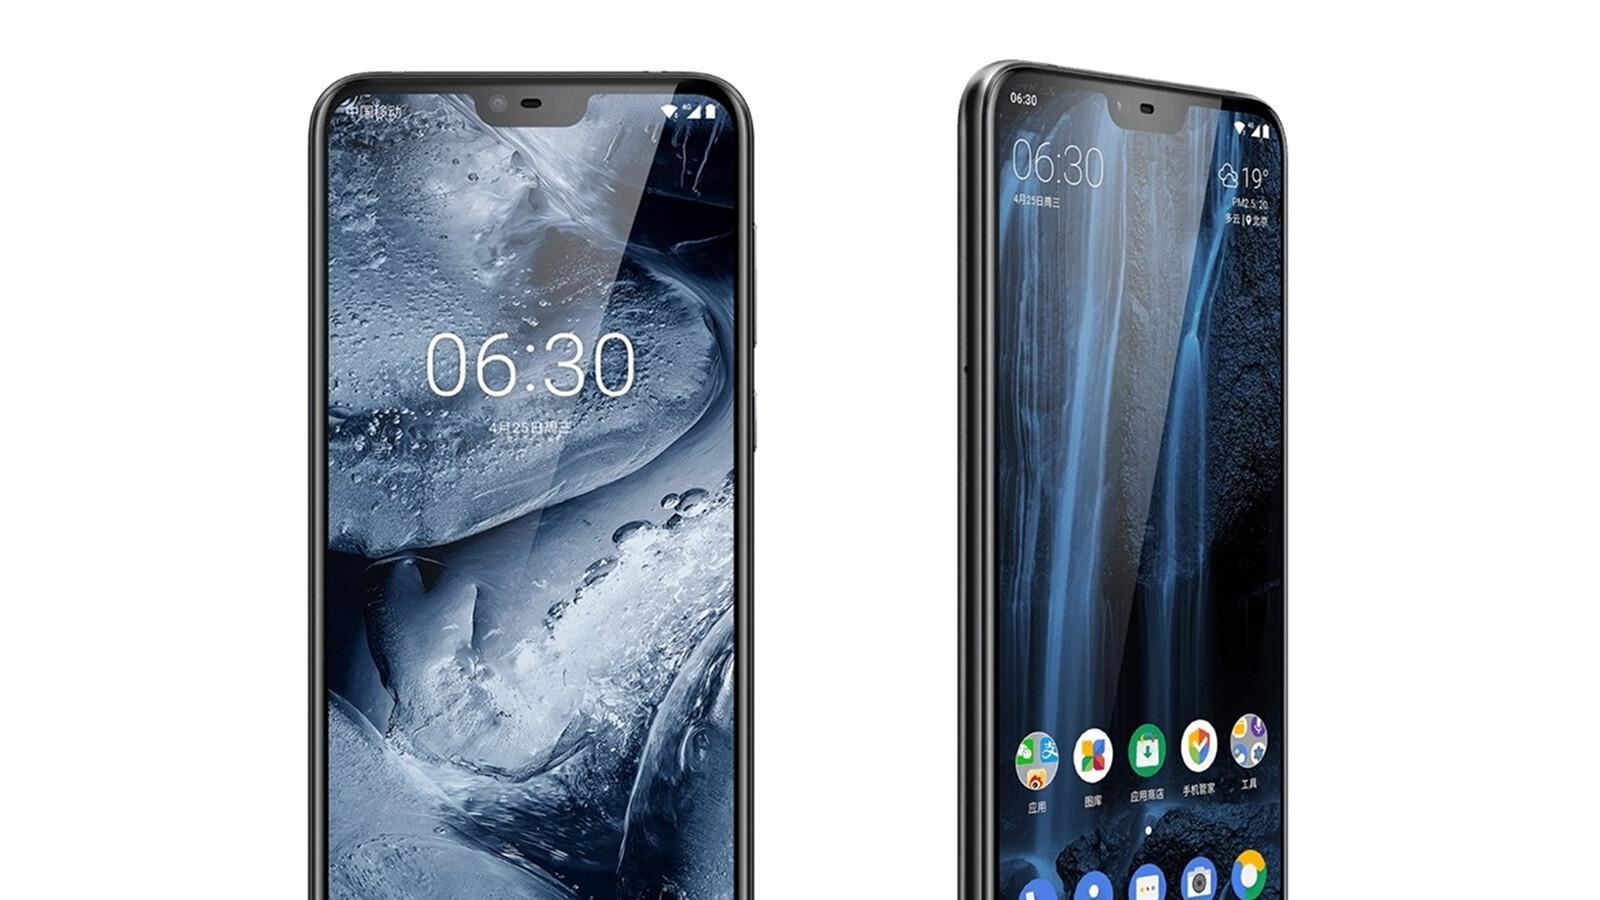 Nokia 6 1 Plus Benchmark Reveals Partial Specs Ahead Of Launch